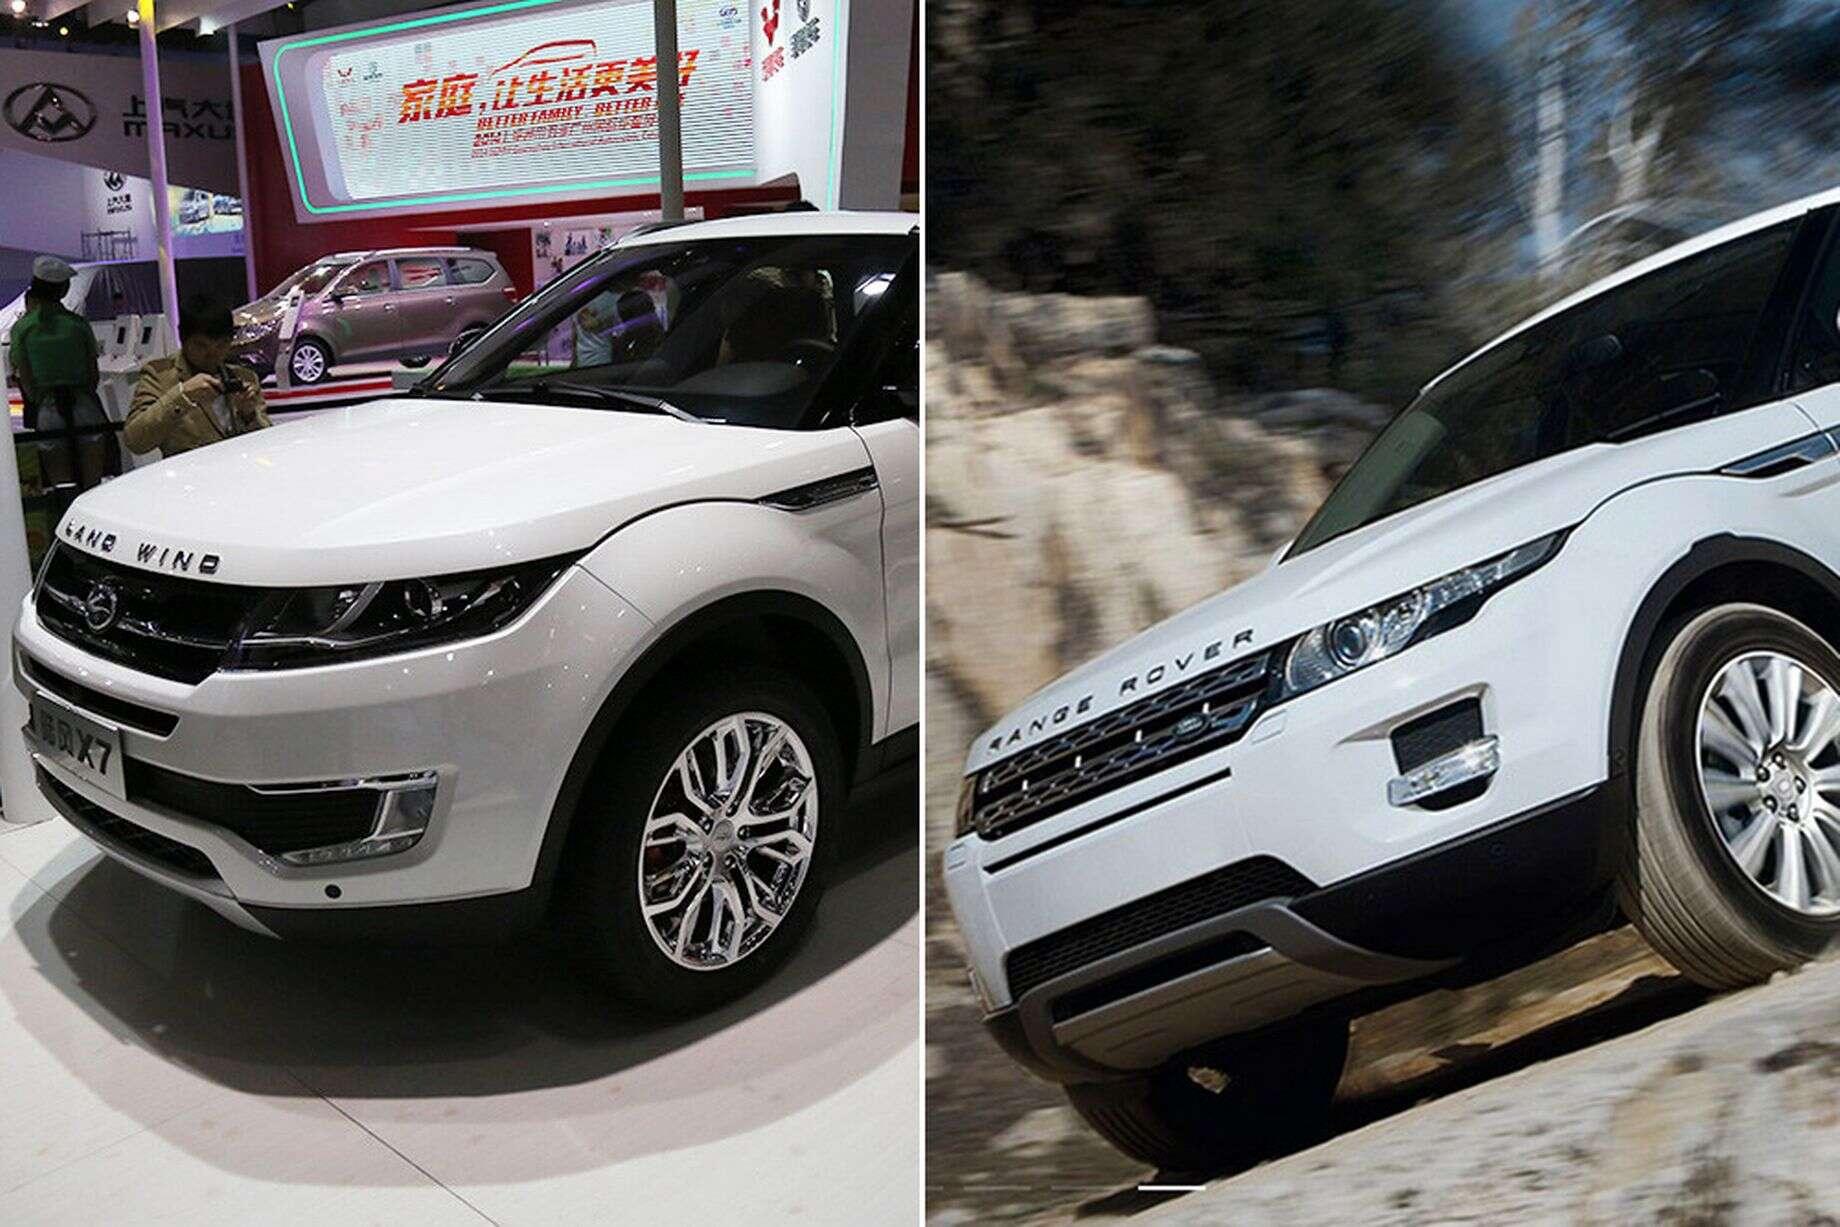 Chineses lançam cópia de Range Rover Evoque